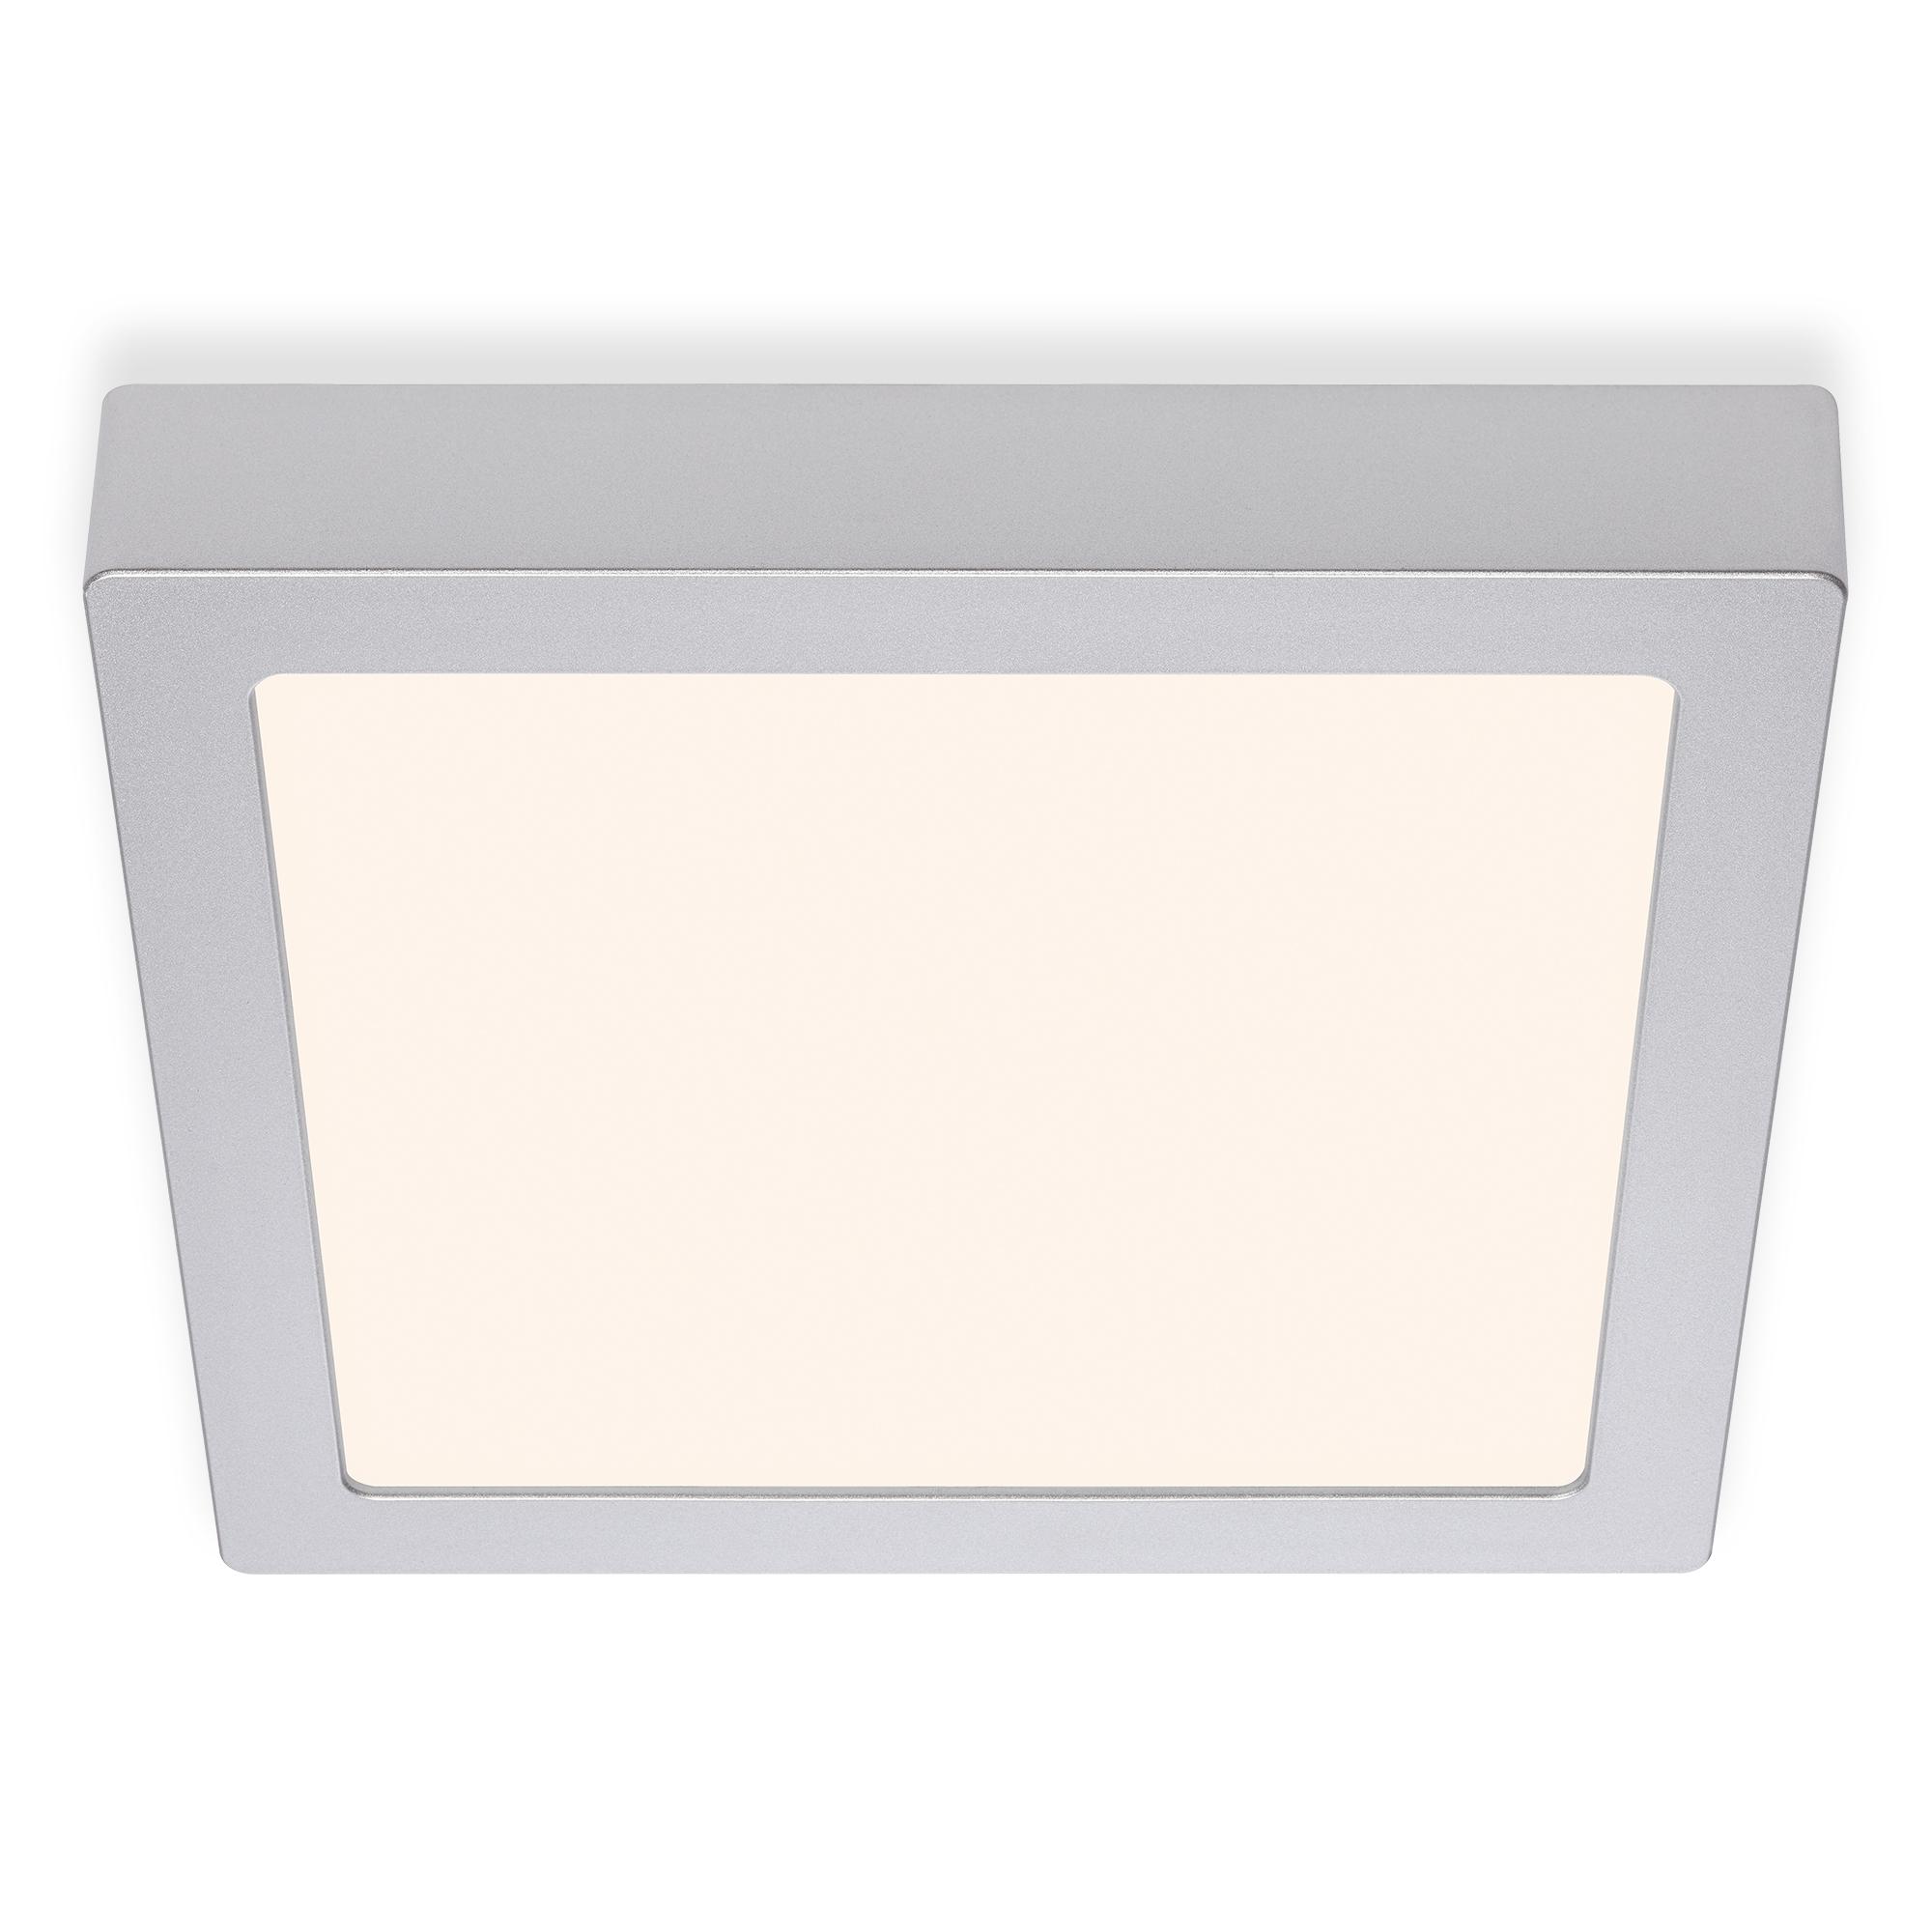 LED Deckenleuchte, 22,5 cm, 16,5 W, Chrom-Matt